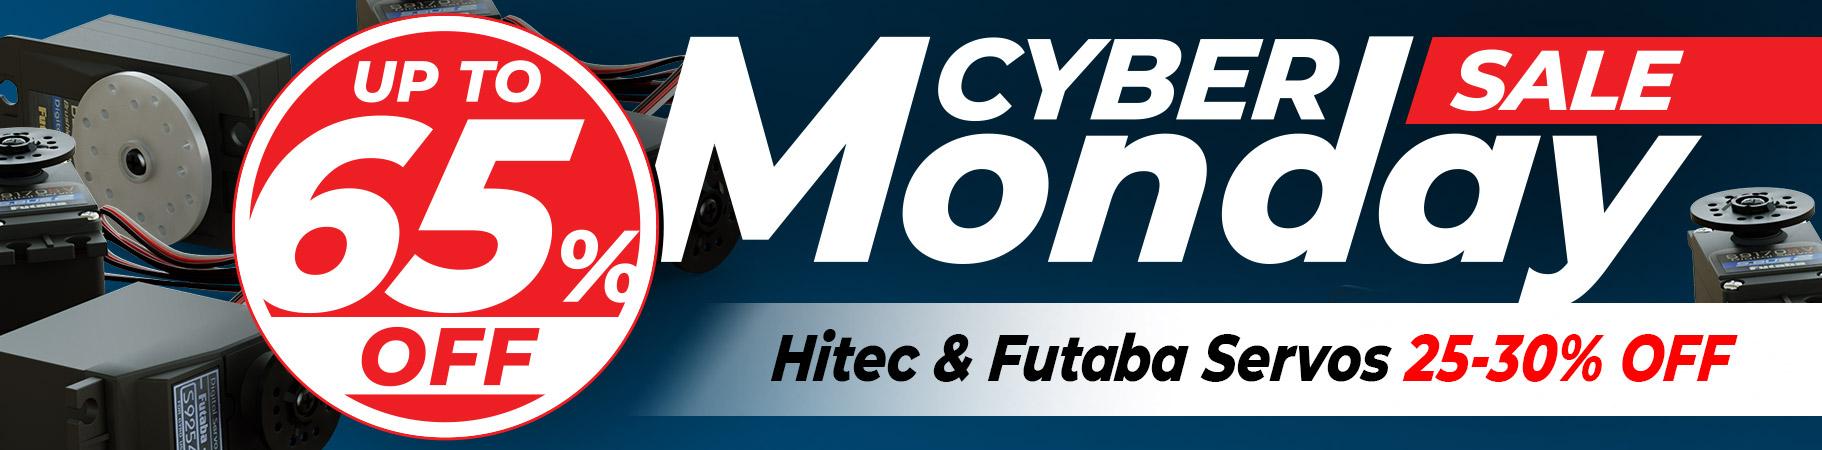 CyberMondaySale_Futaba_1822x450.jpg